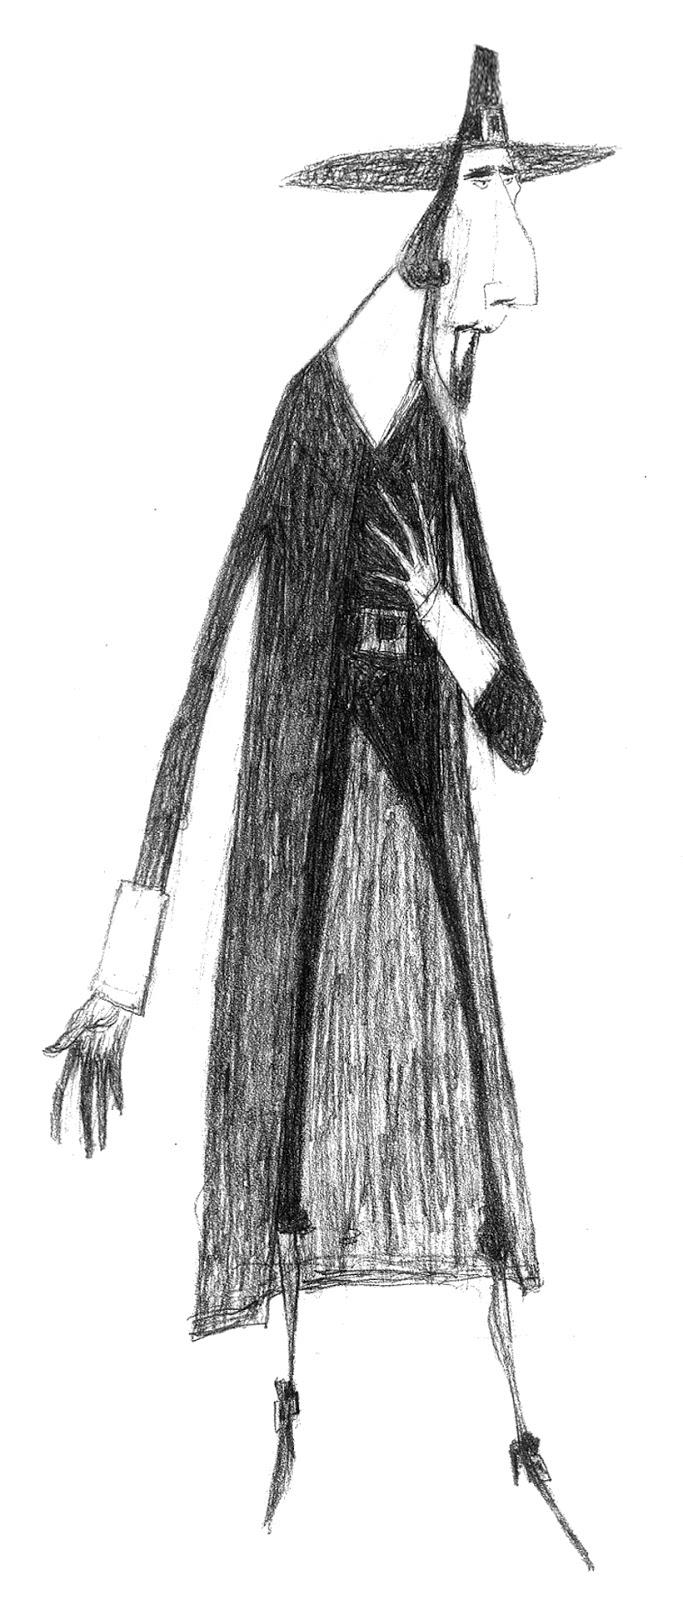 067-paranorman-concept-art-character-design-Spanish puritan.jpg